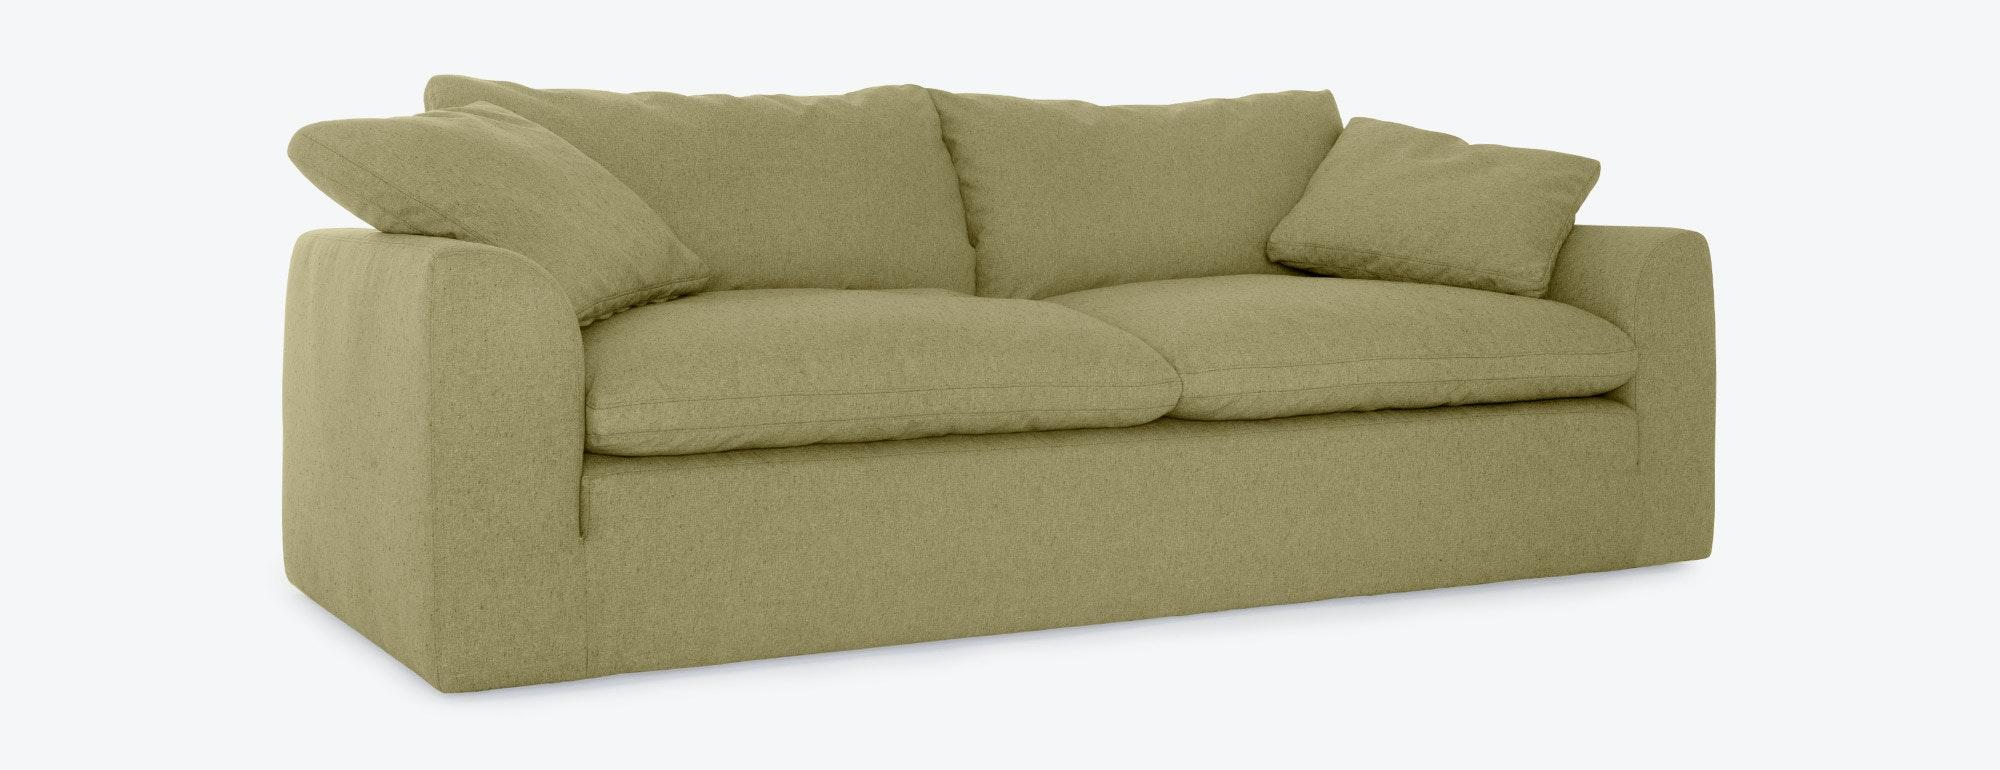 Grass Couch Bryant Sofa Joybird